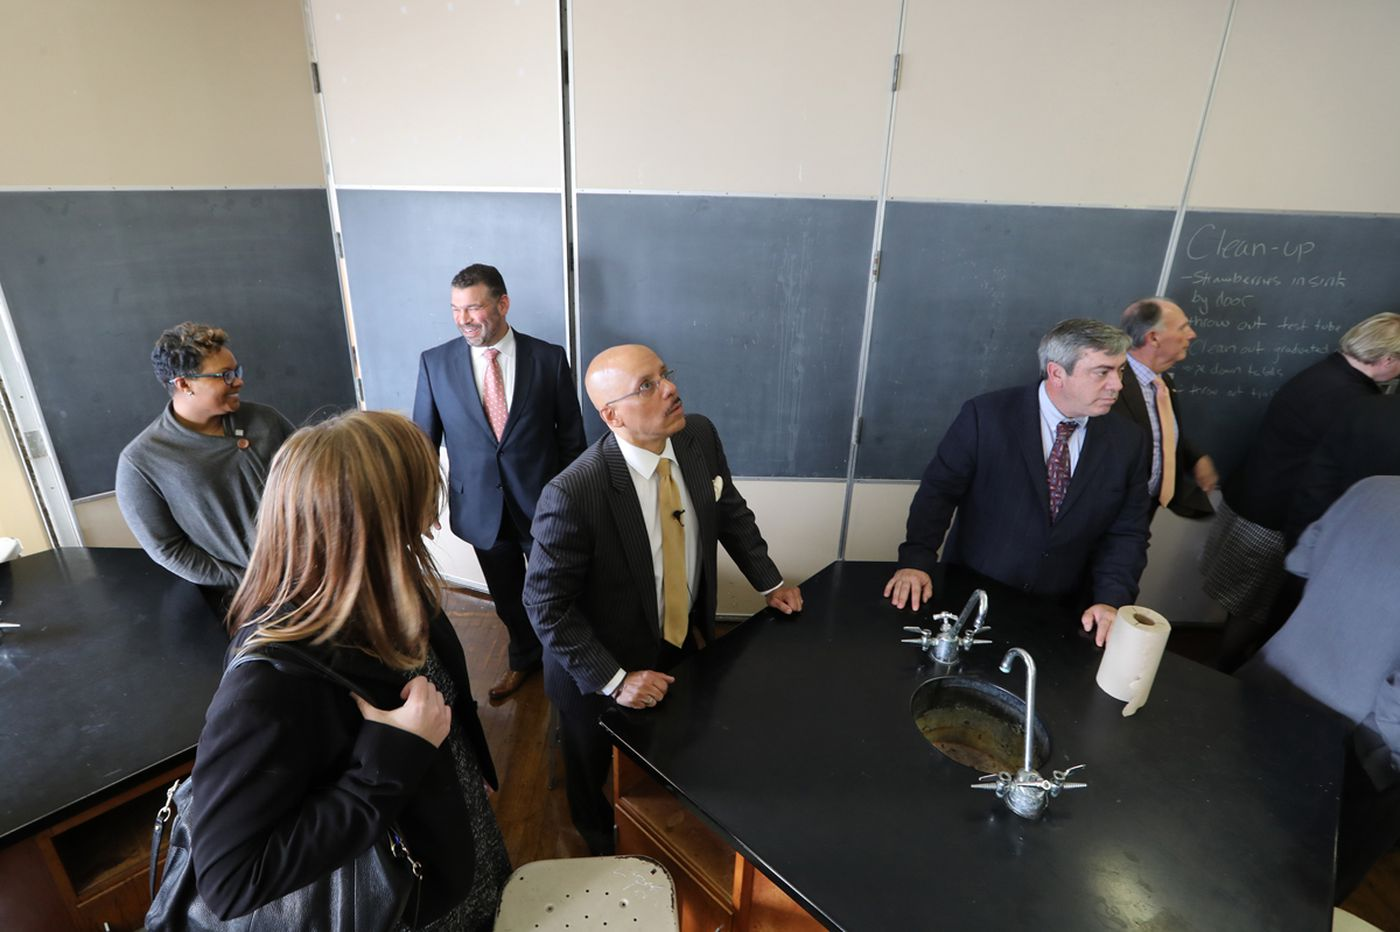 Officials told Philadelphia schools need $5 billion in repairs